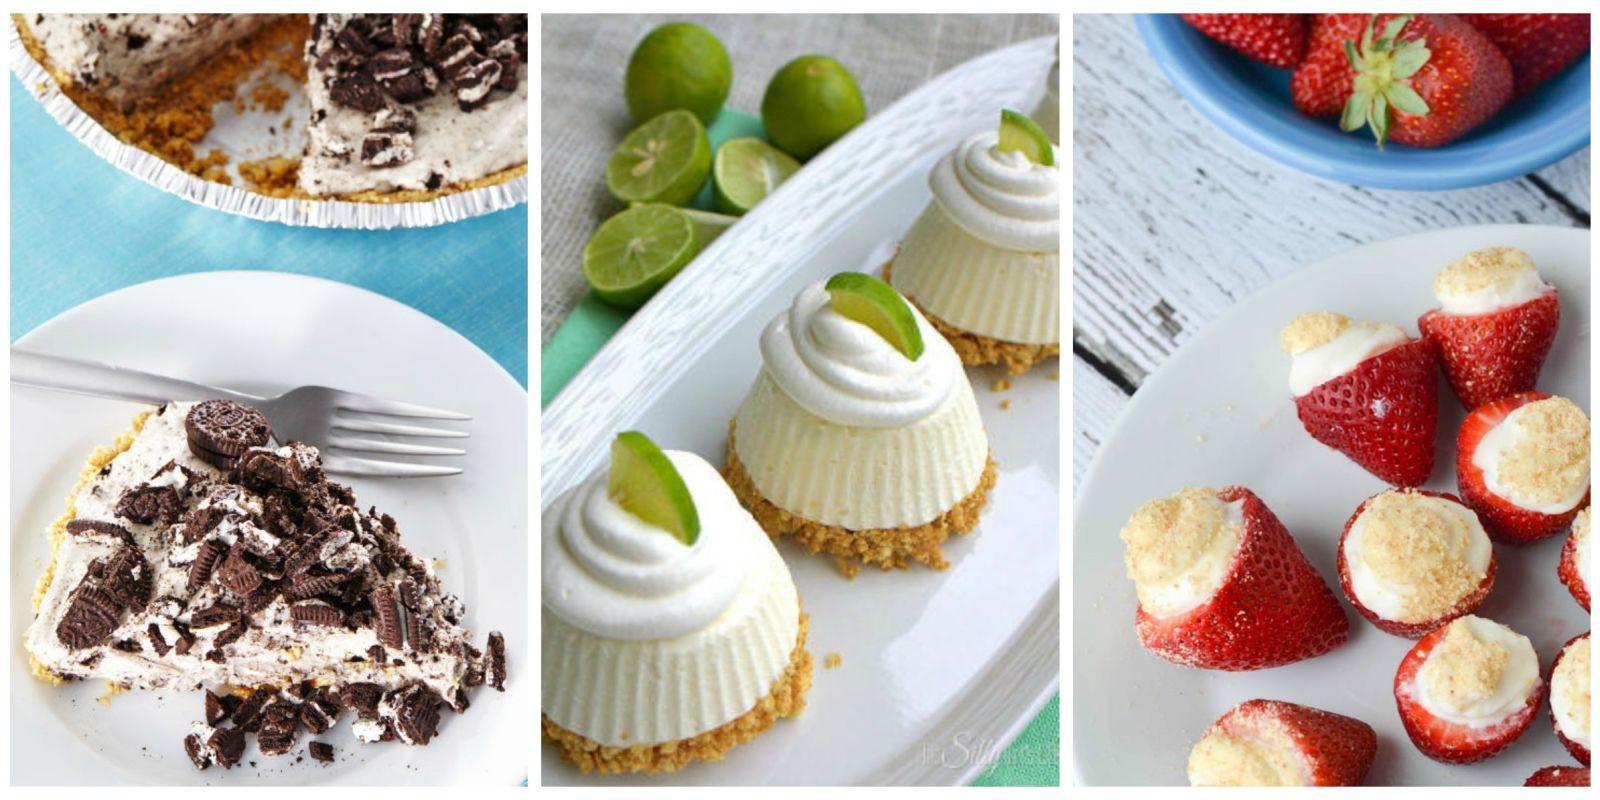 Desserts For Summer  57 Easy Summer Desserts Best Recipes for Frozen Summer